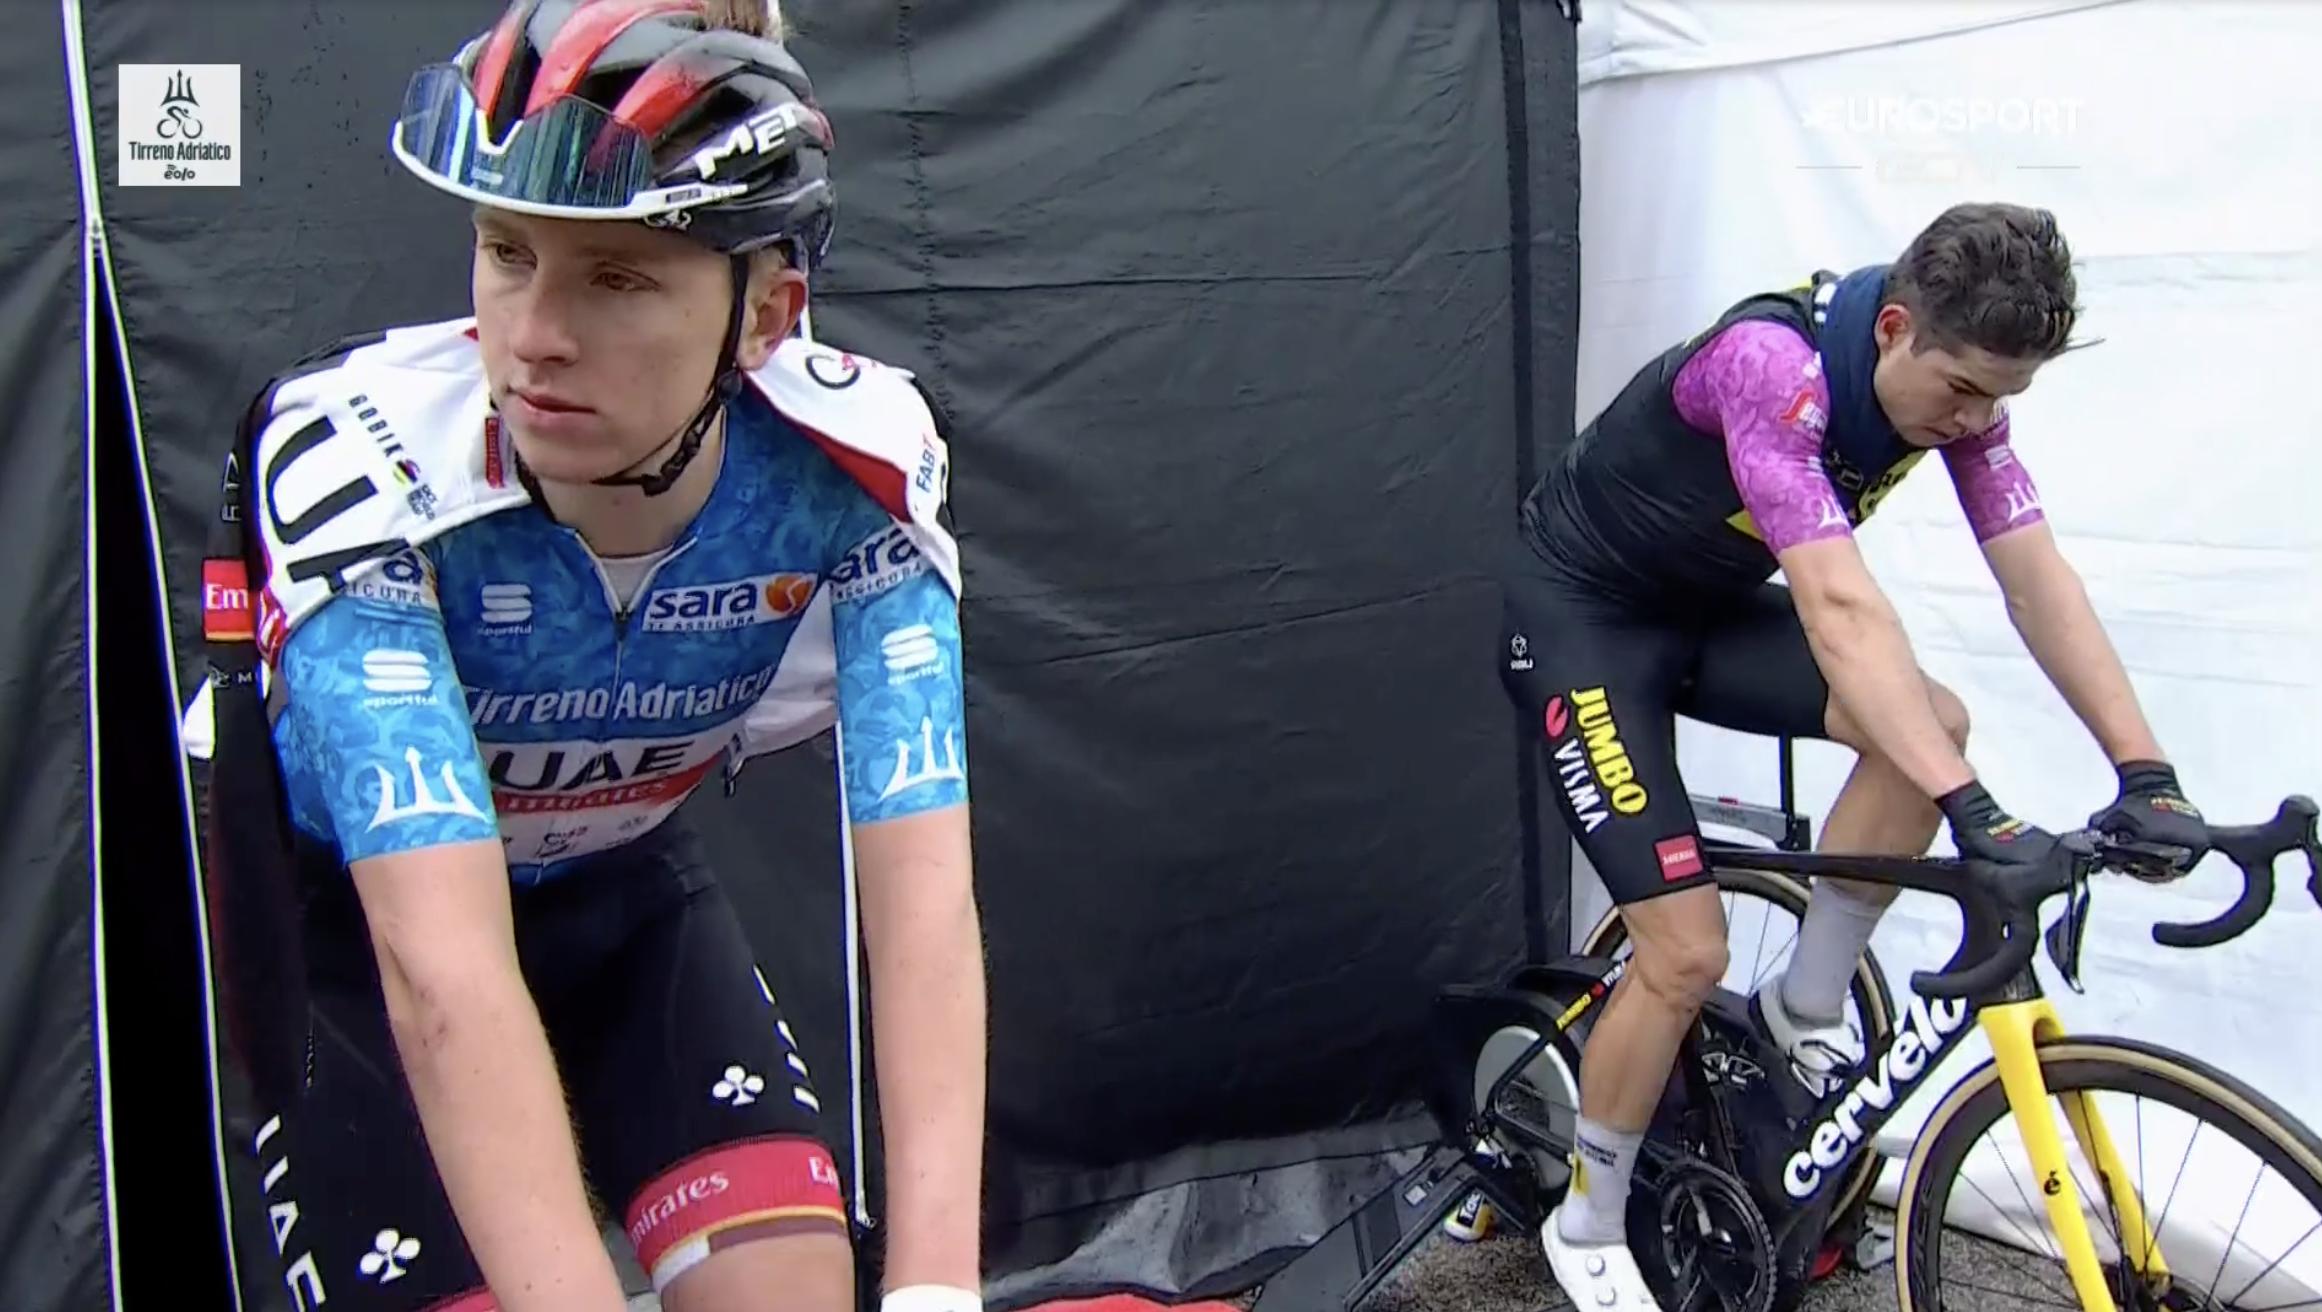 Van Aert Pogacar Tirreno stage 5 Eurosport warm down